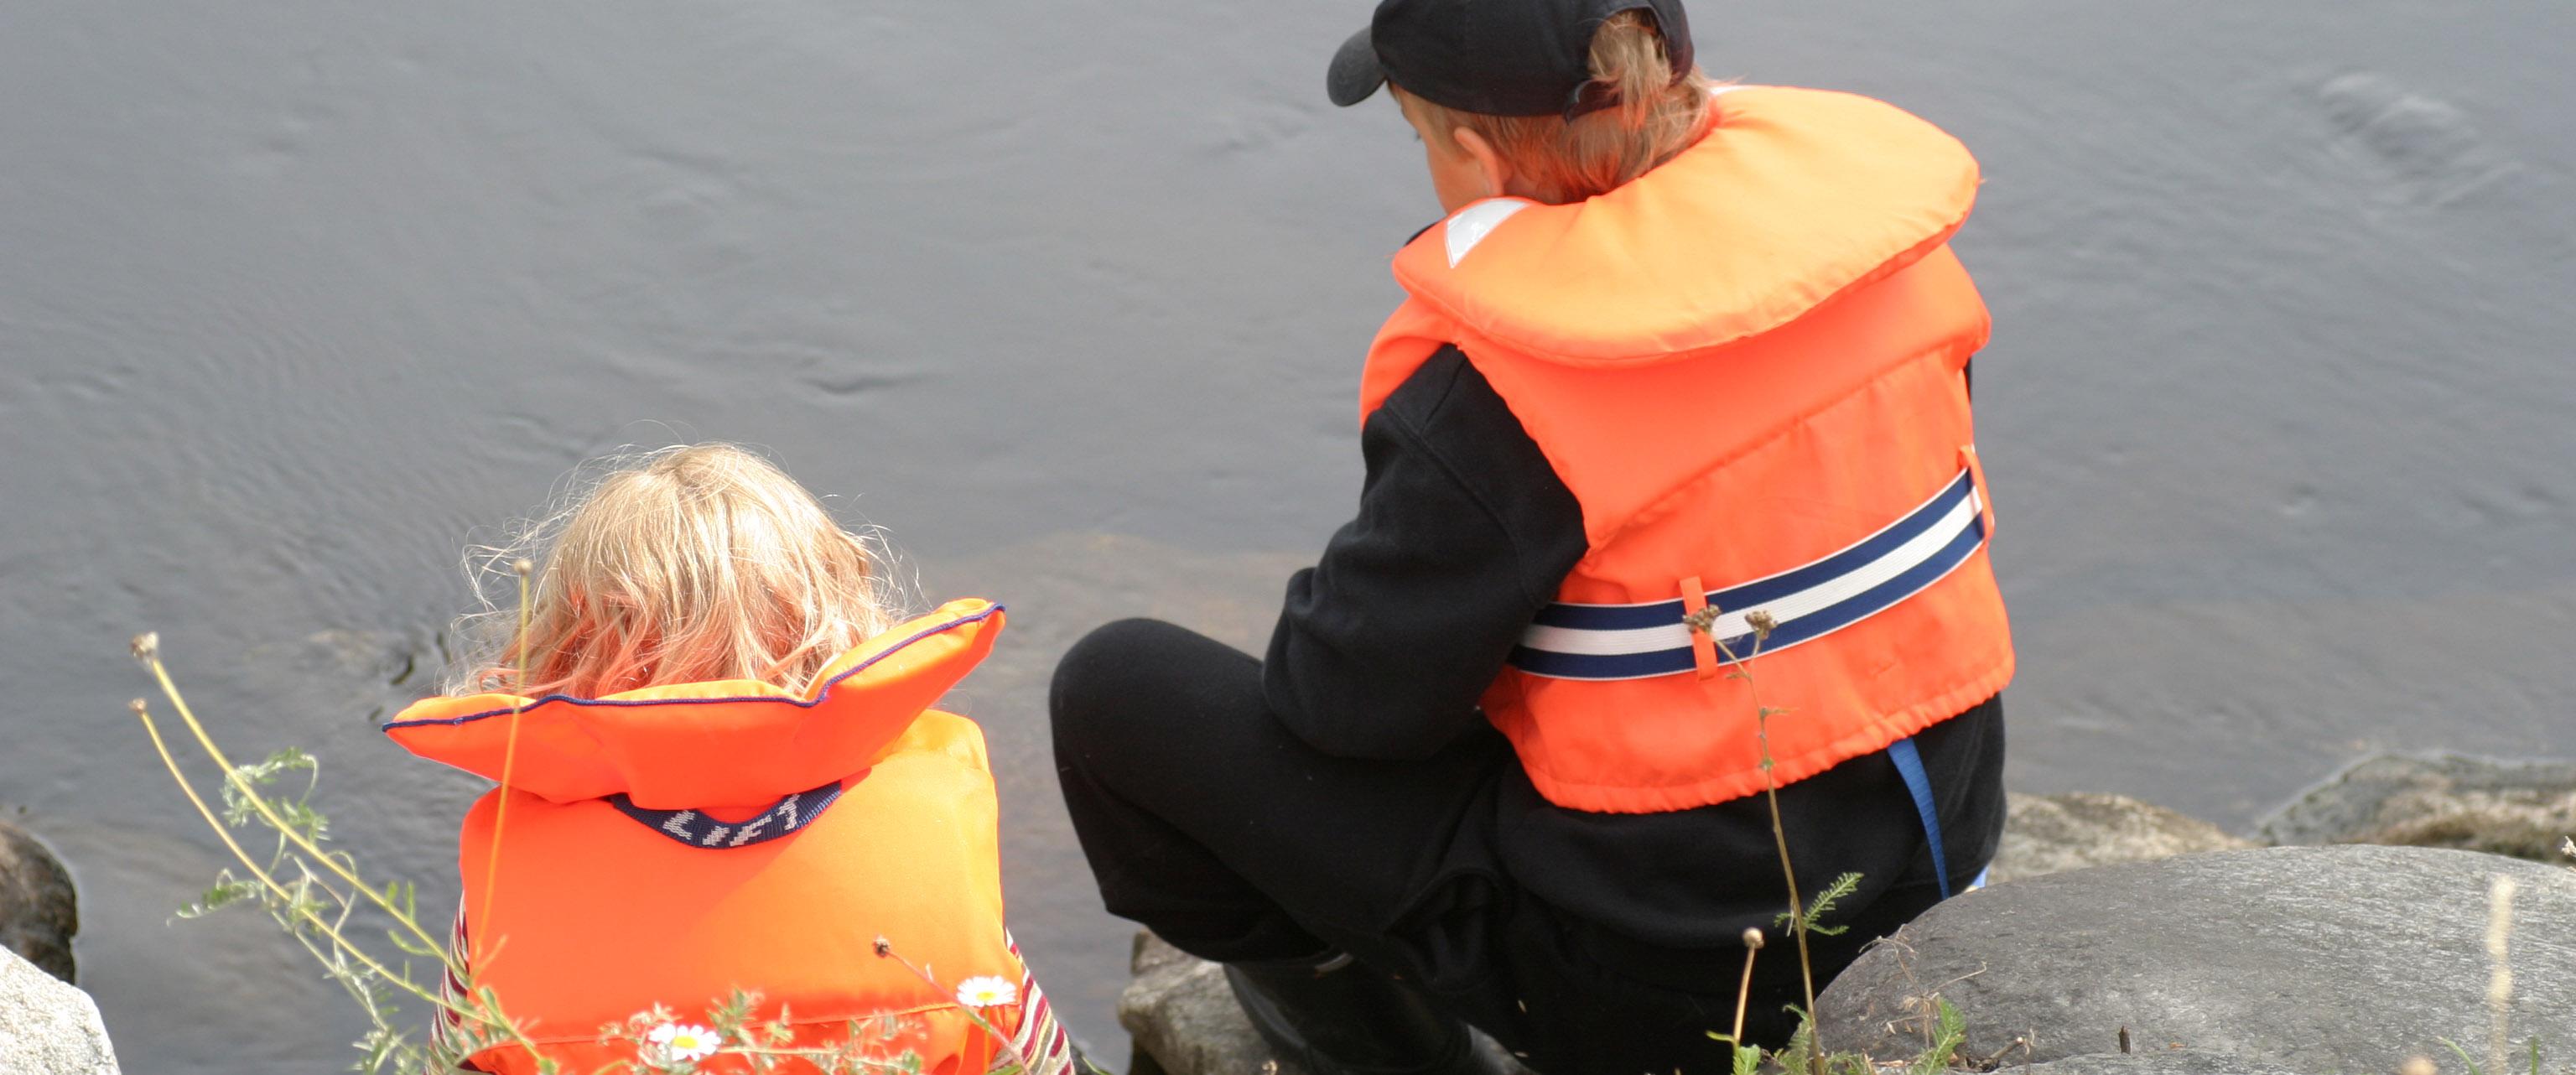 Unga fiskare i flytväst.